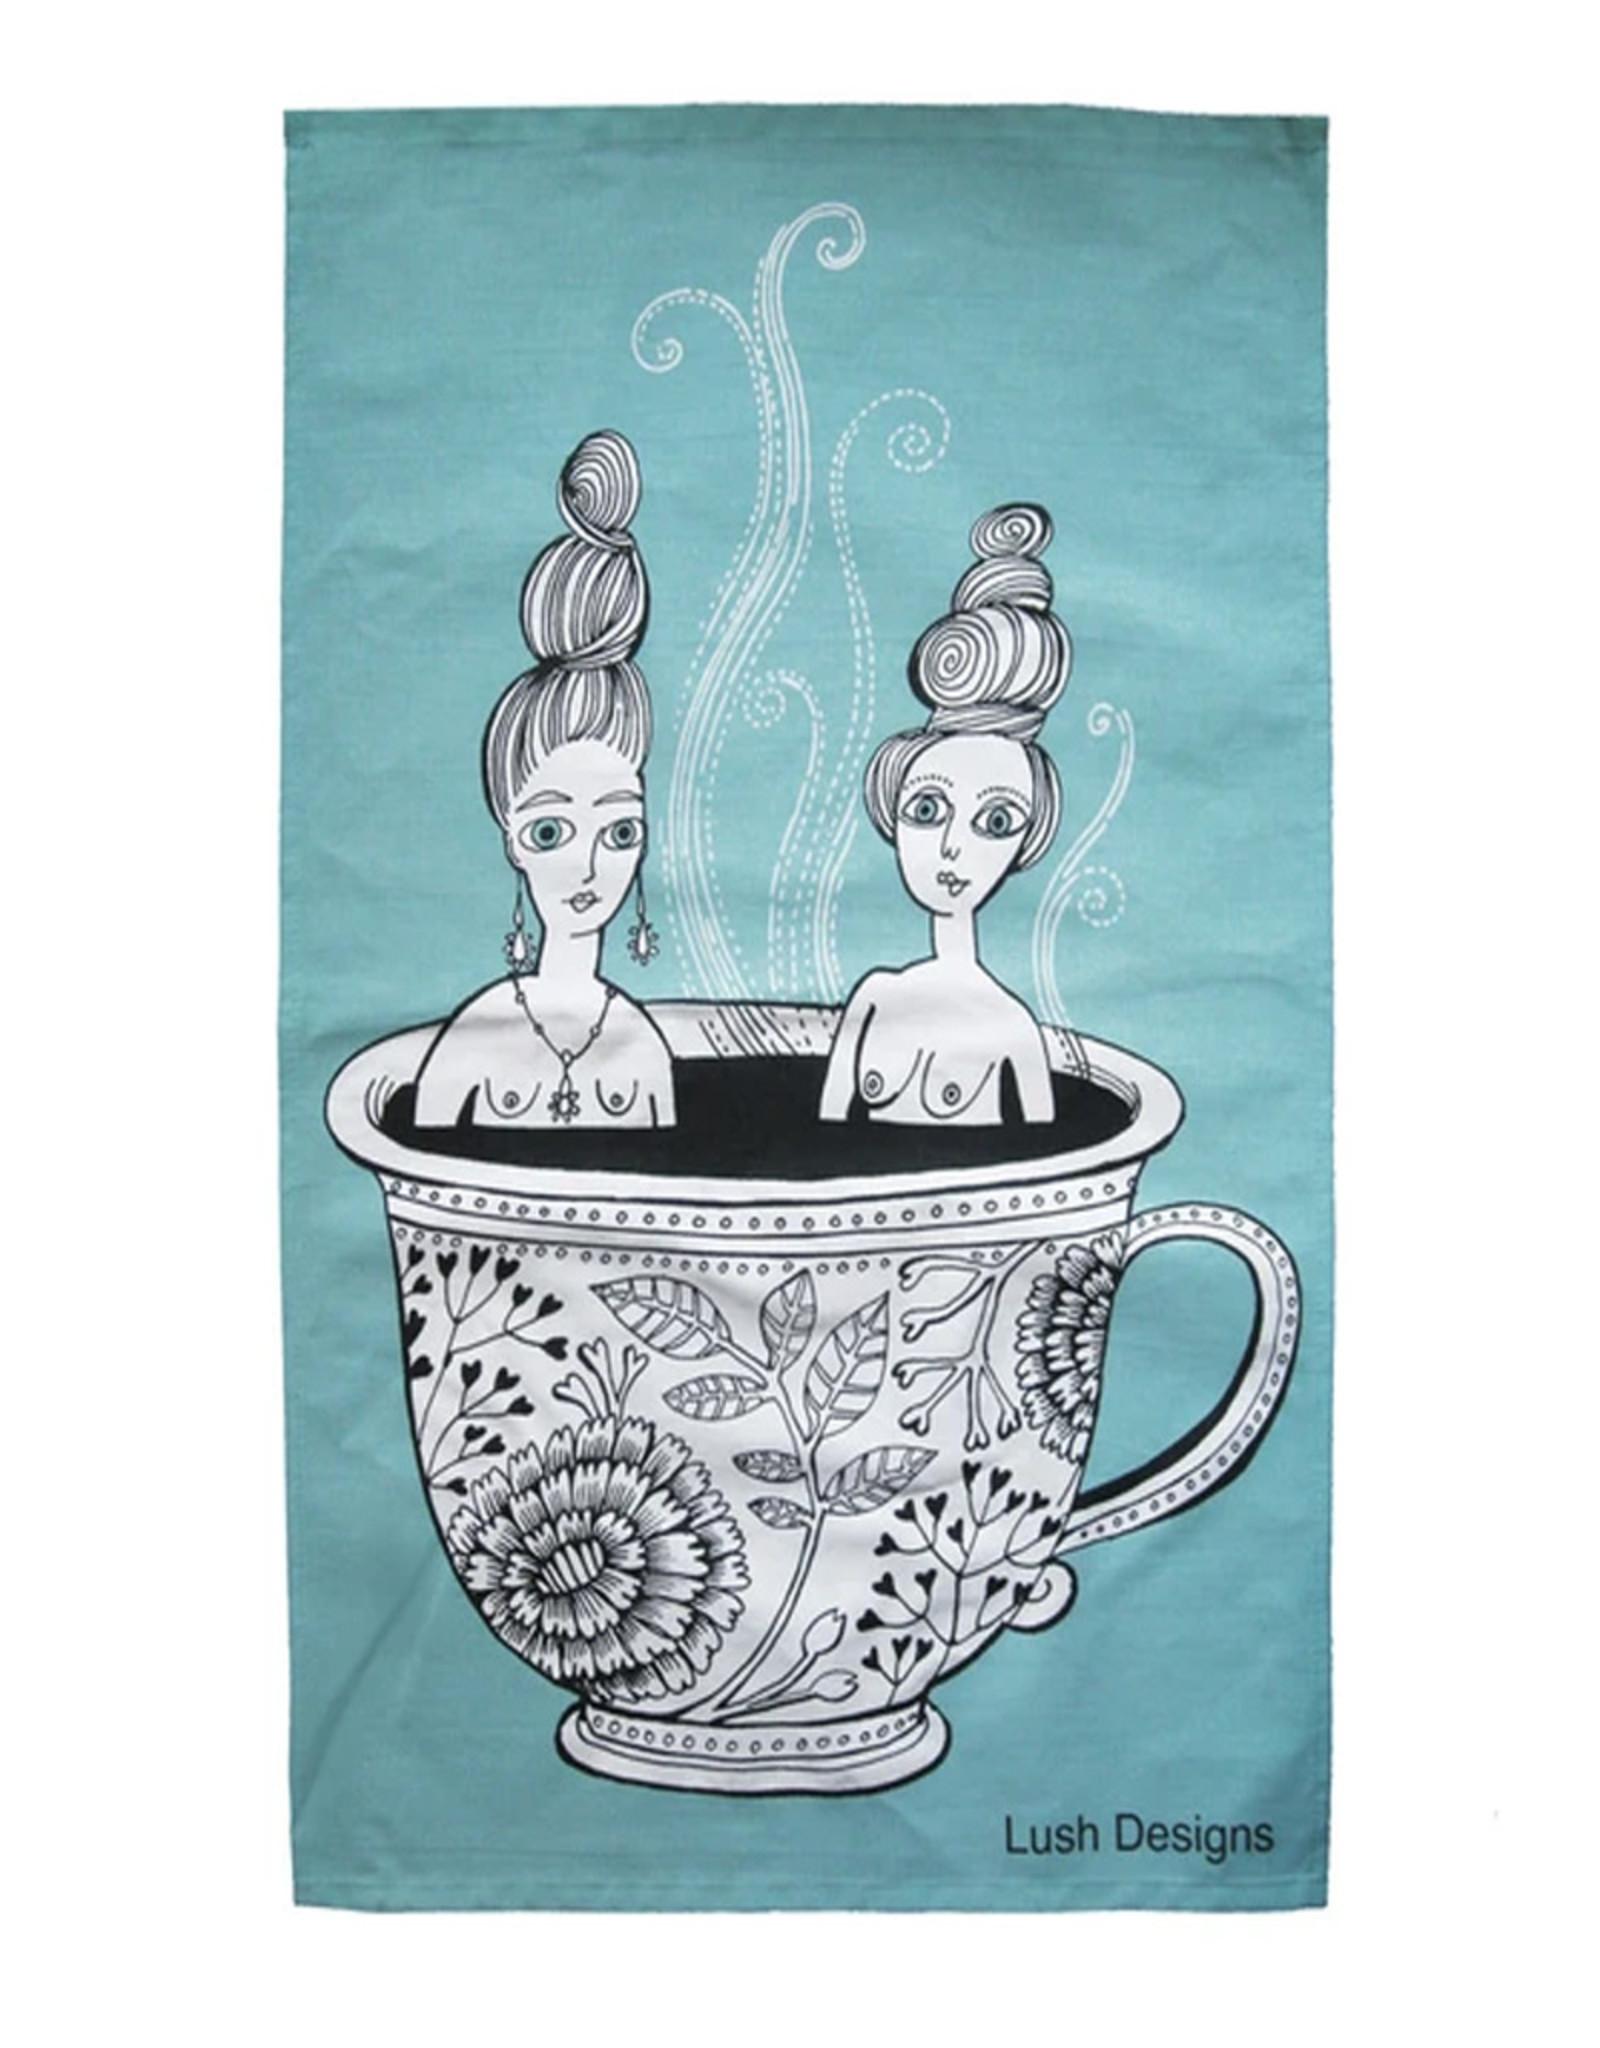 Lush Designs Lush Tea Towel Blue Teacup Ladies